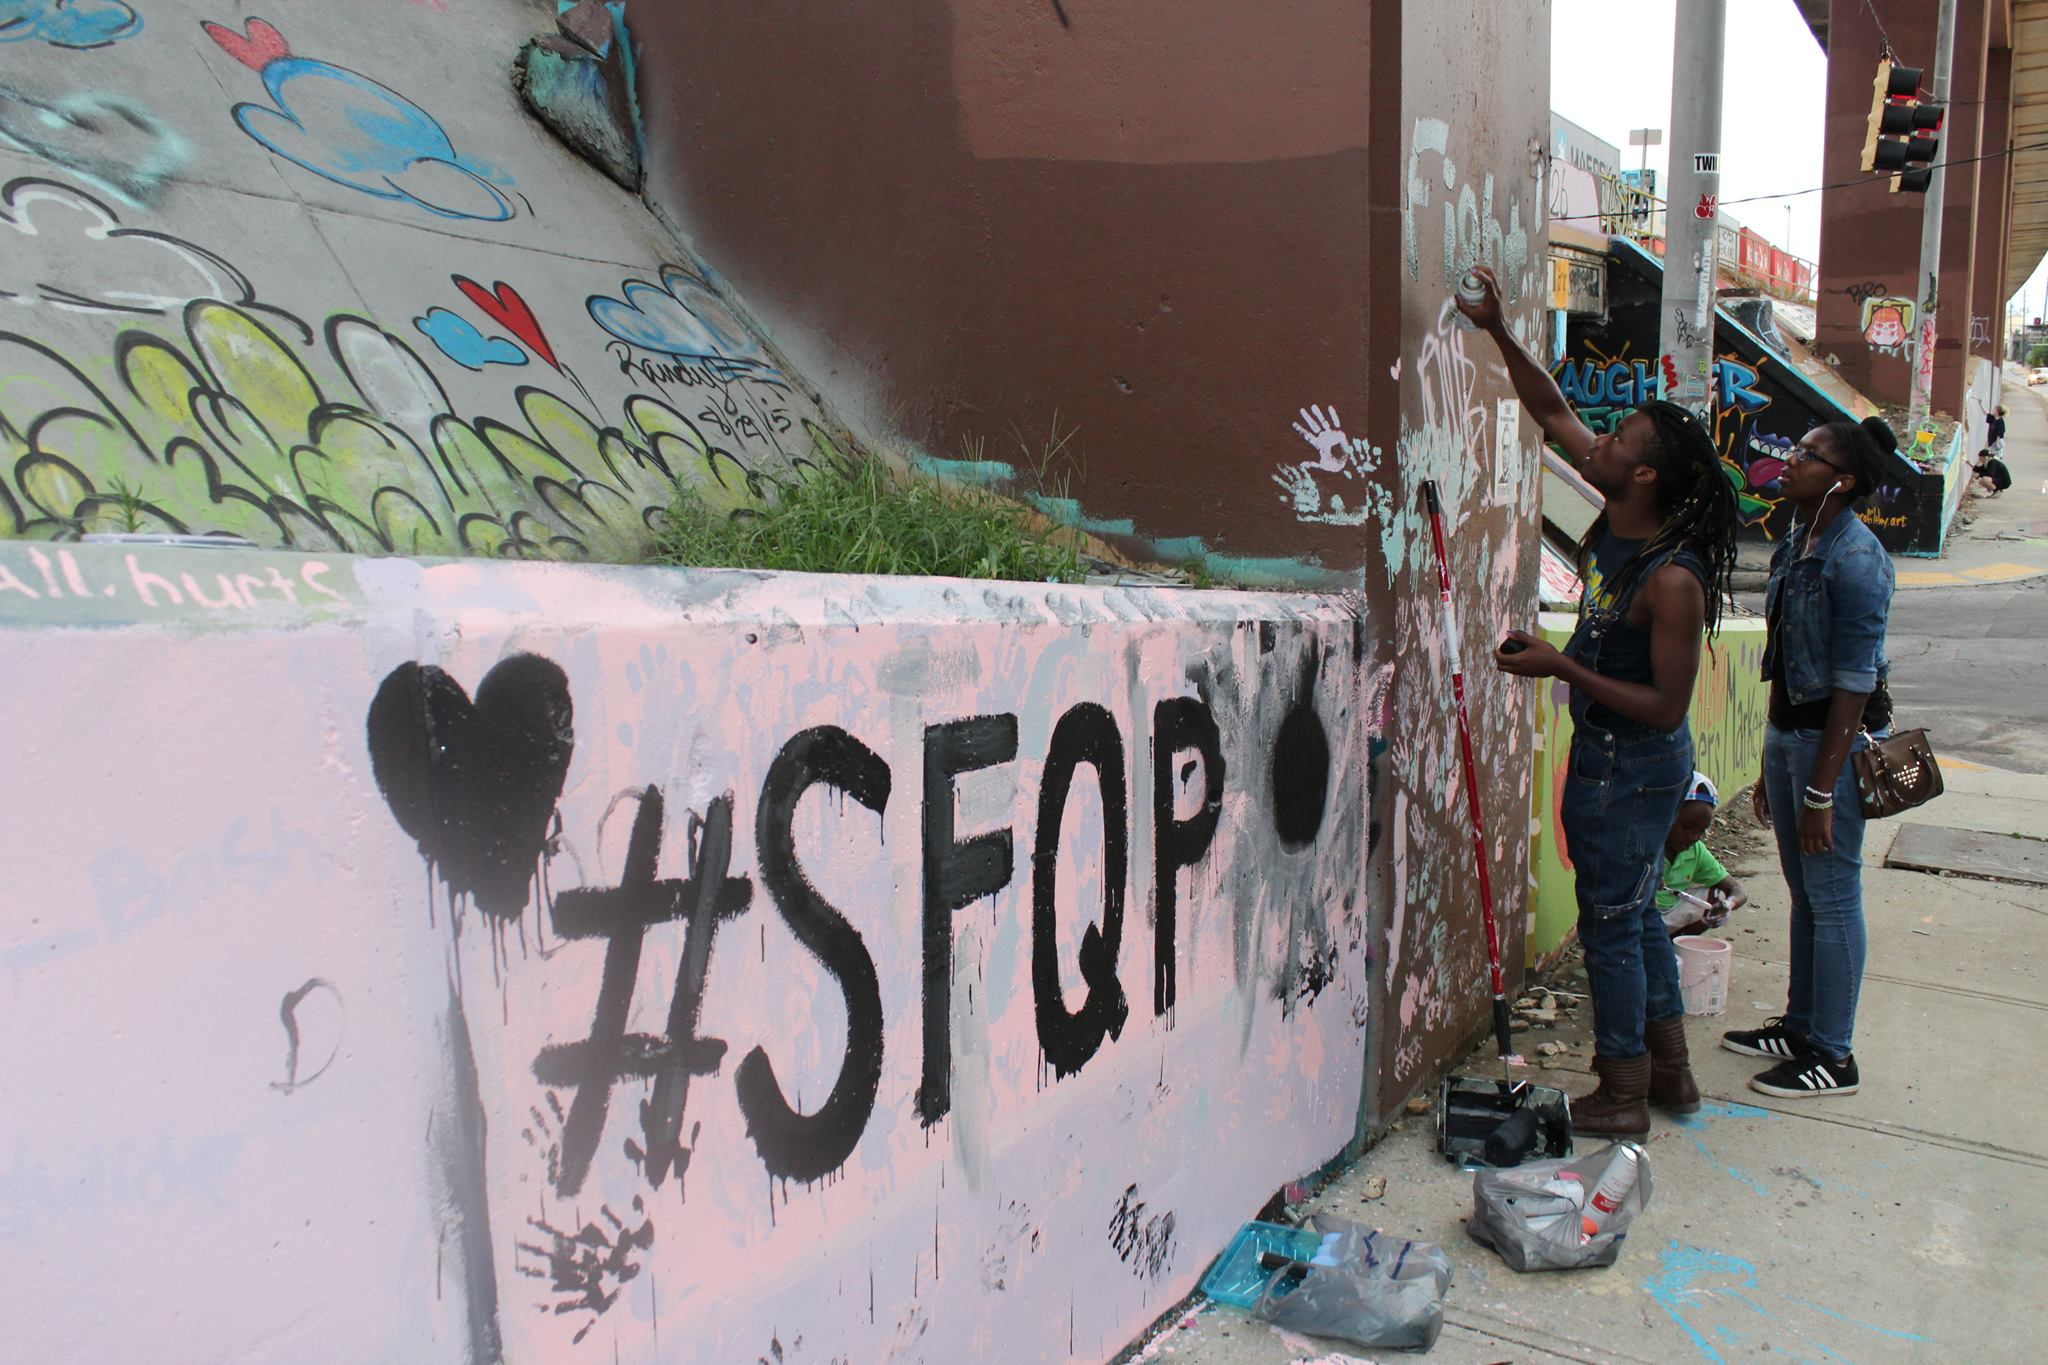 SFQP organizers painting Atlanta local Krog Street Tunnel to promote our 2016 Atlanta festival.